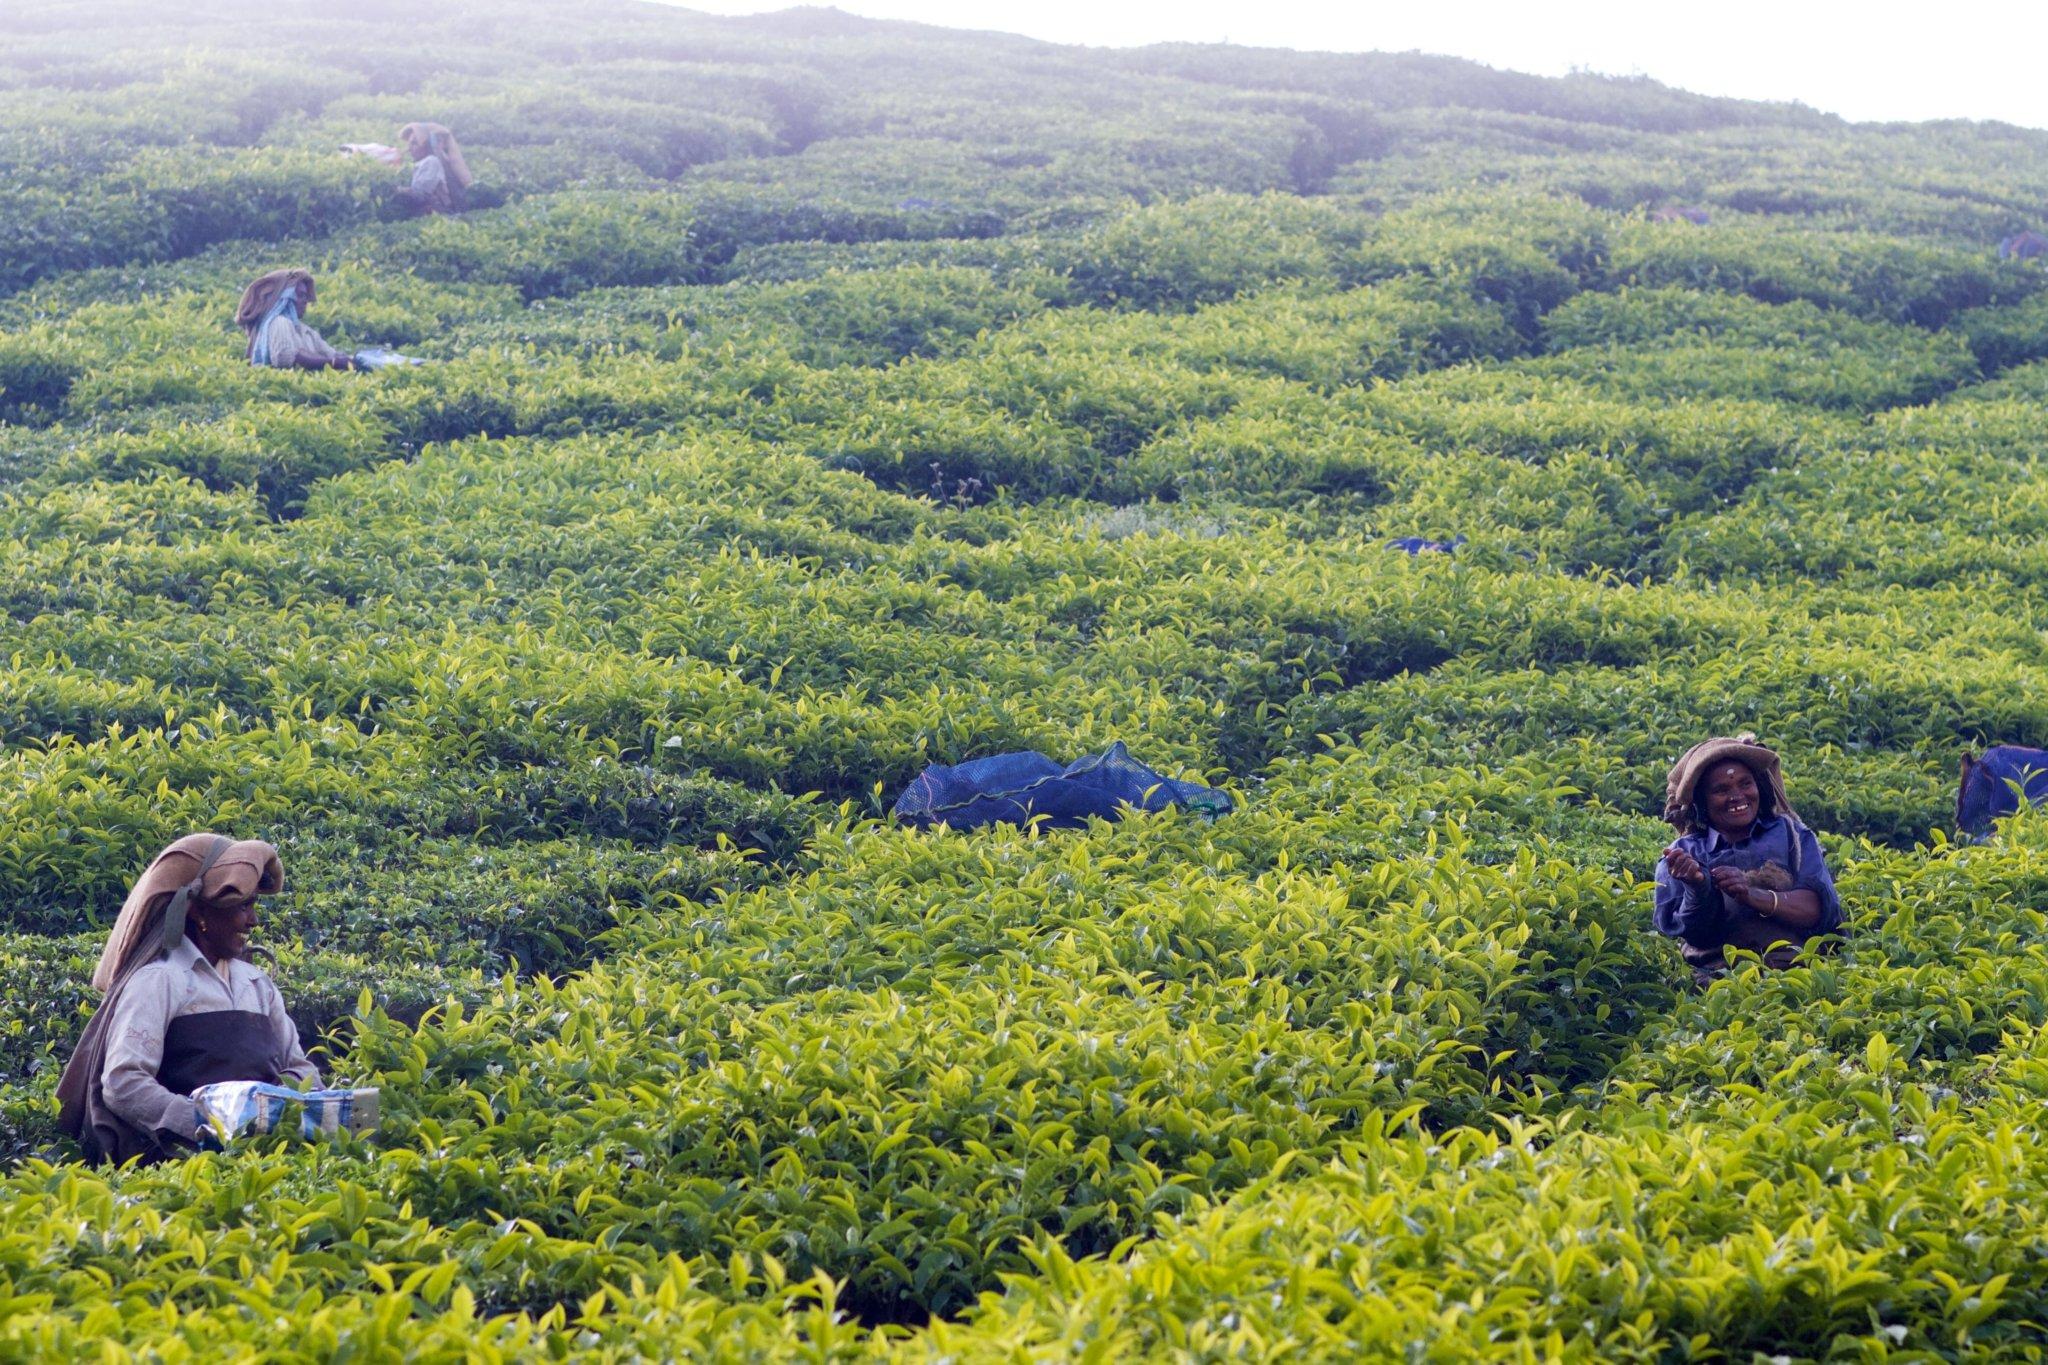 Farmers - Munnar, India